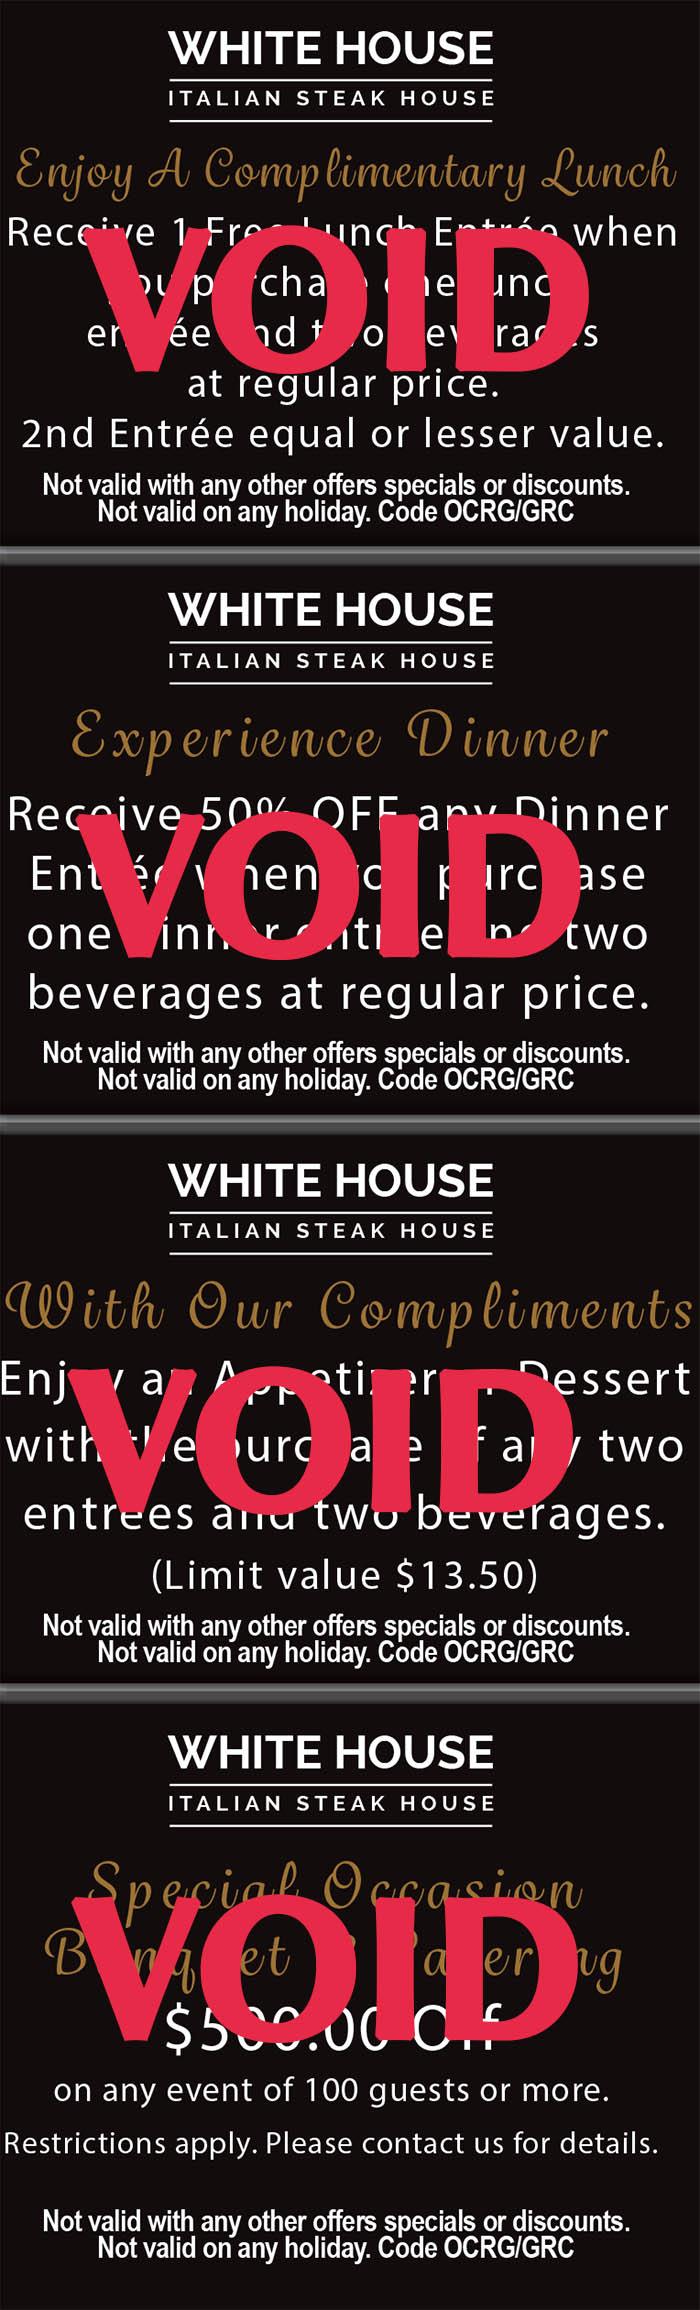 More in Restaurant Reviews + Food